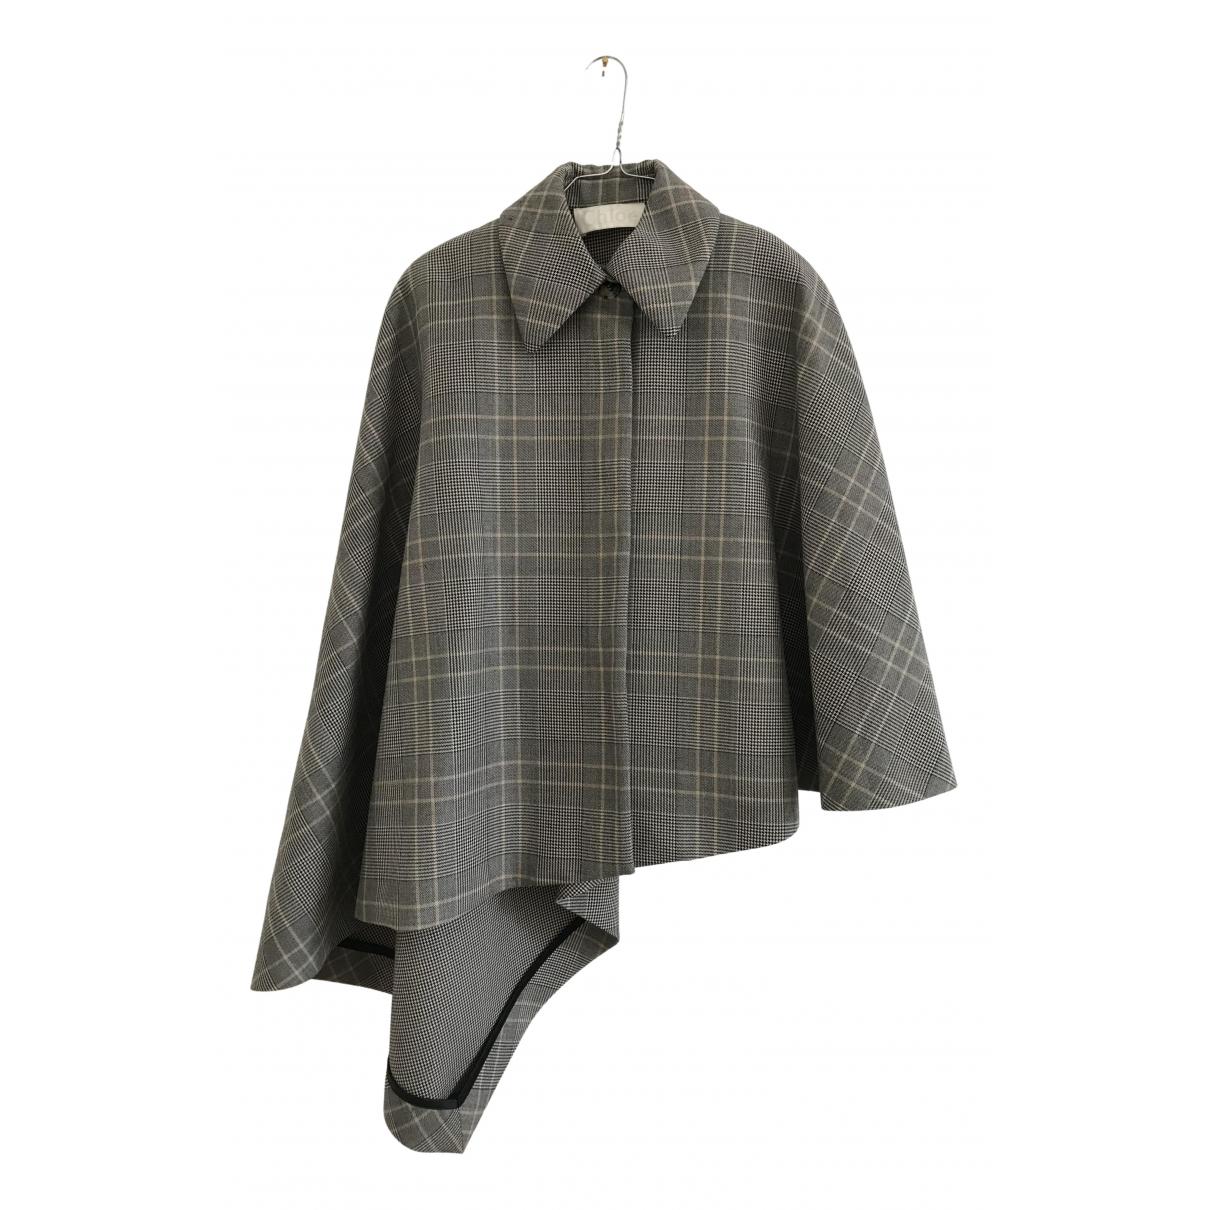 Chloé \N Grey Wool coat for Women M International